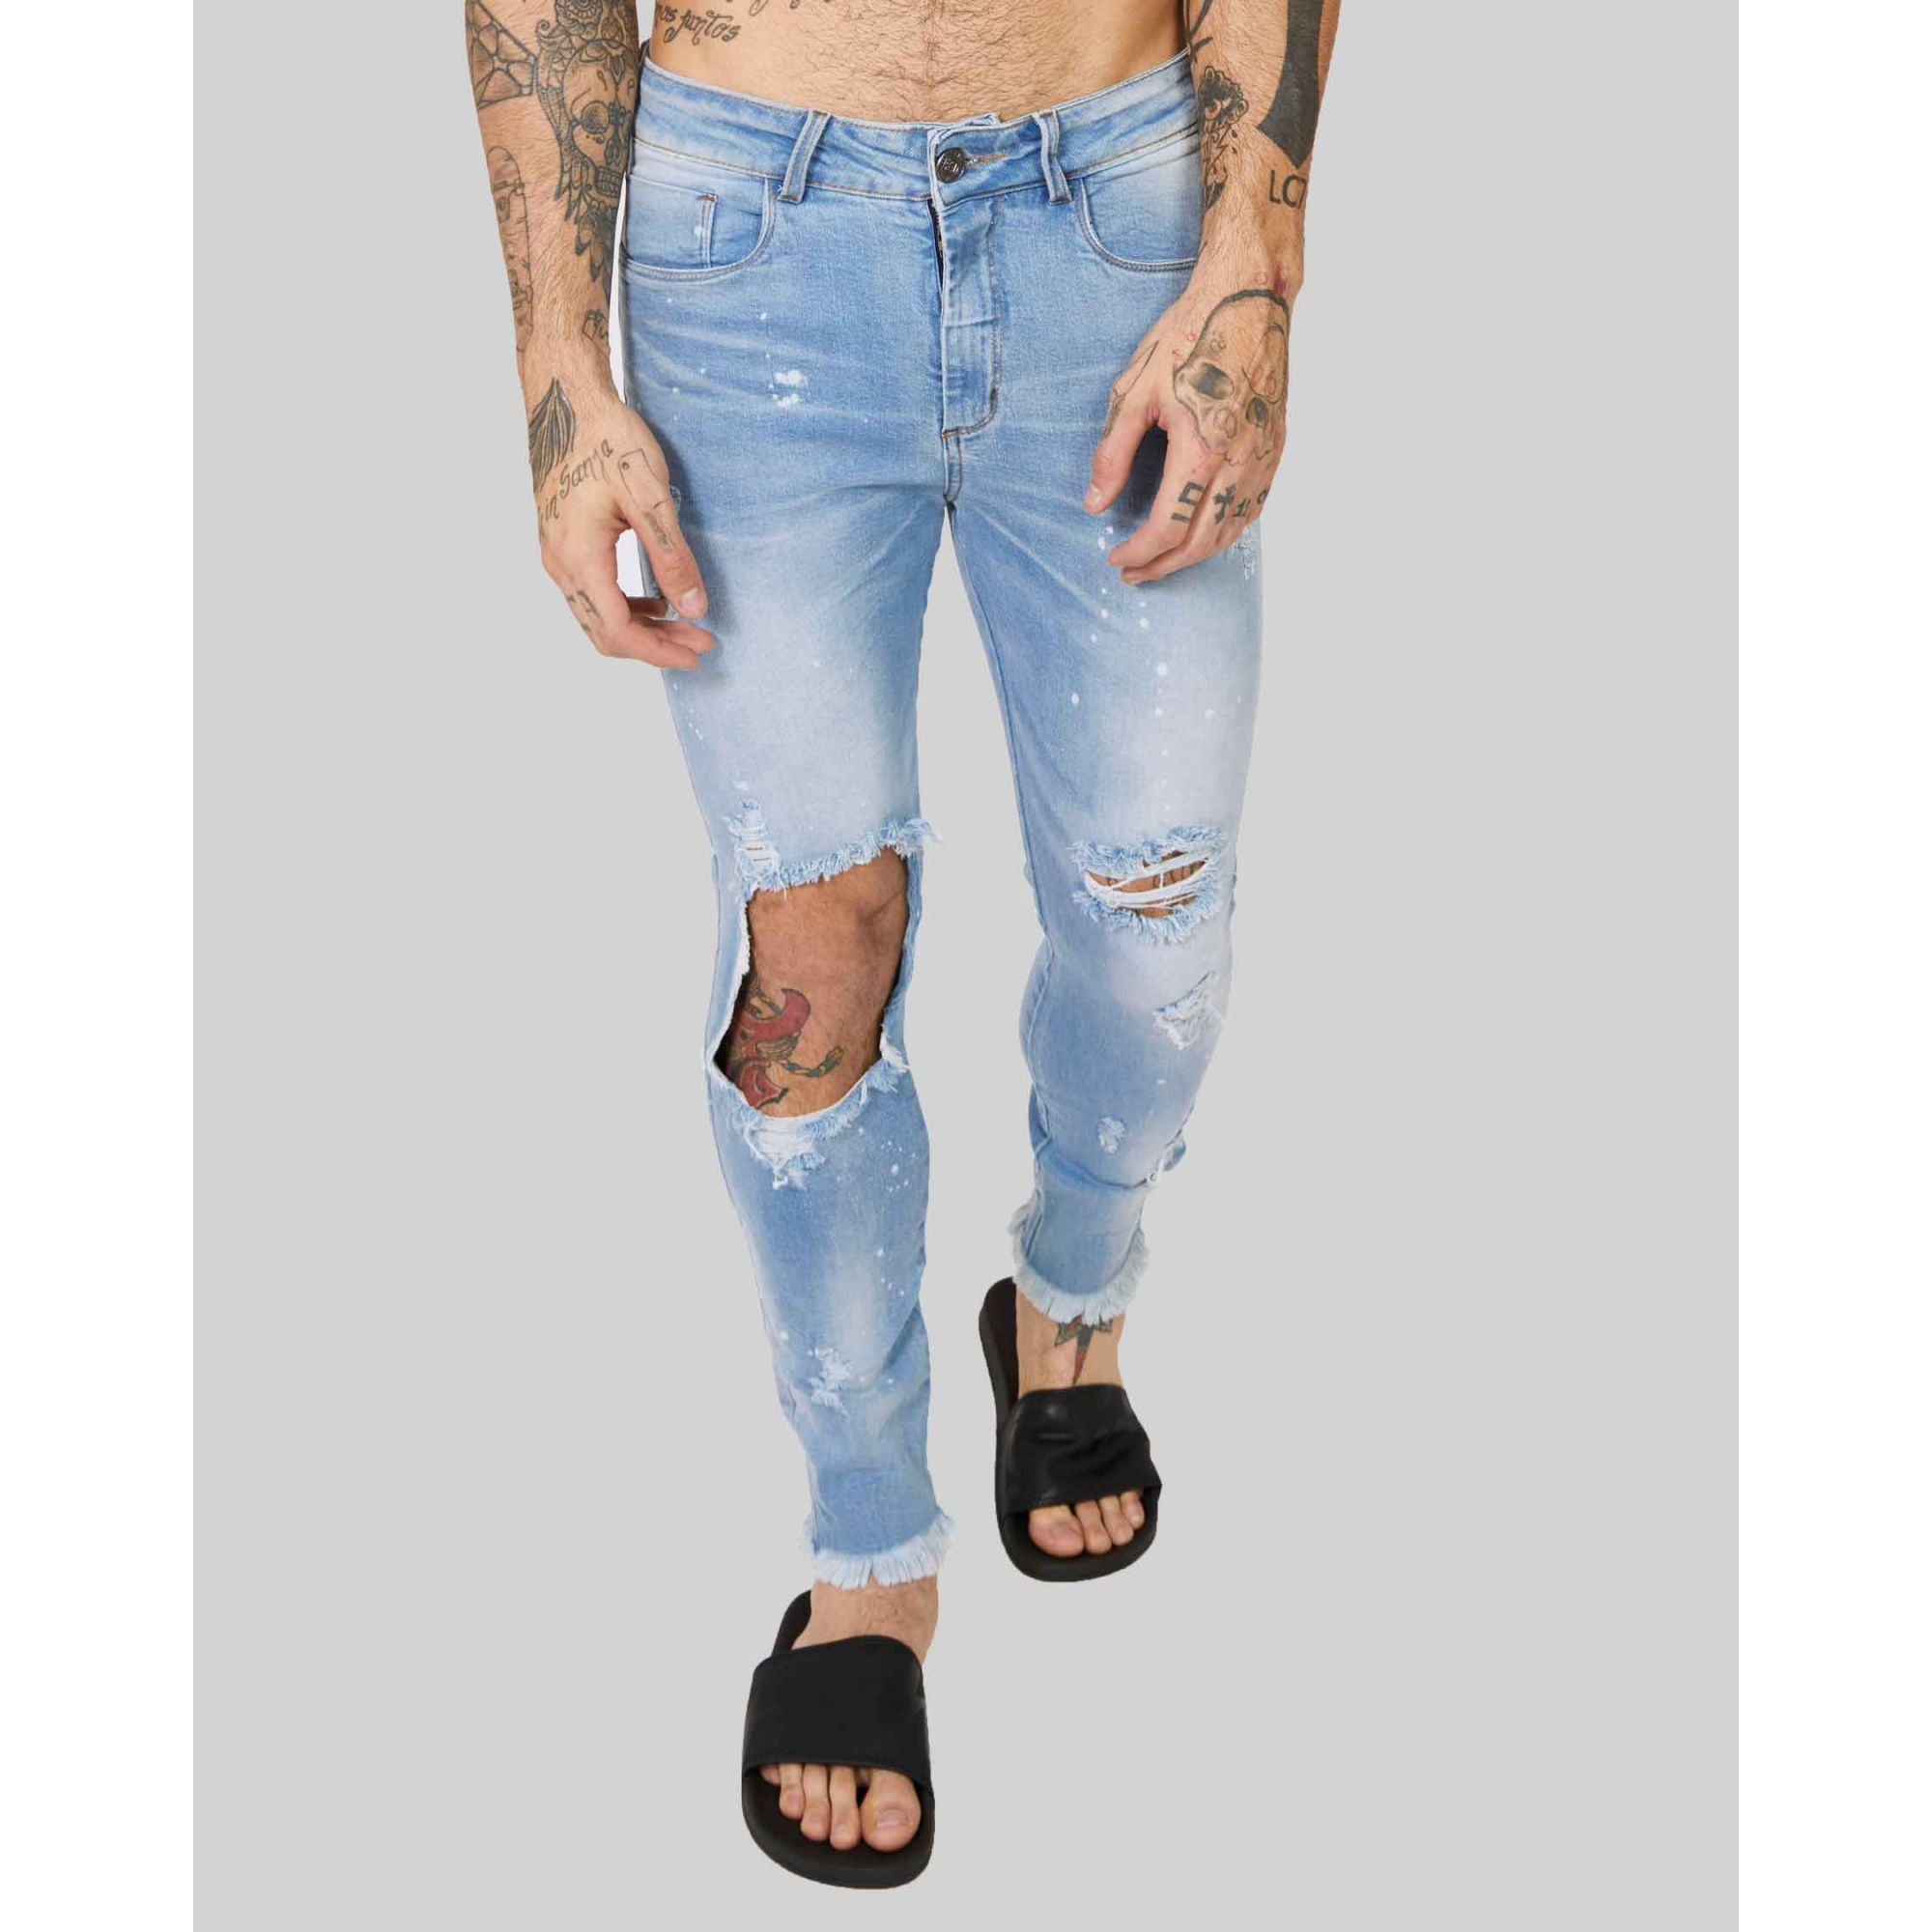 Calça Jeans Buh Rasgada Paint